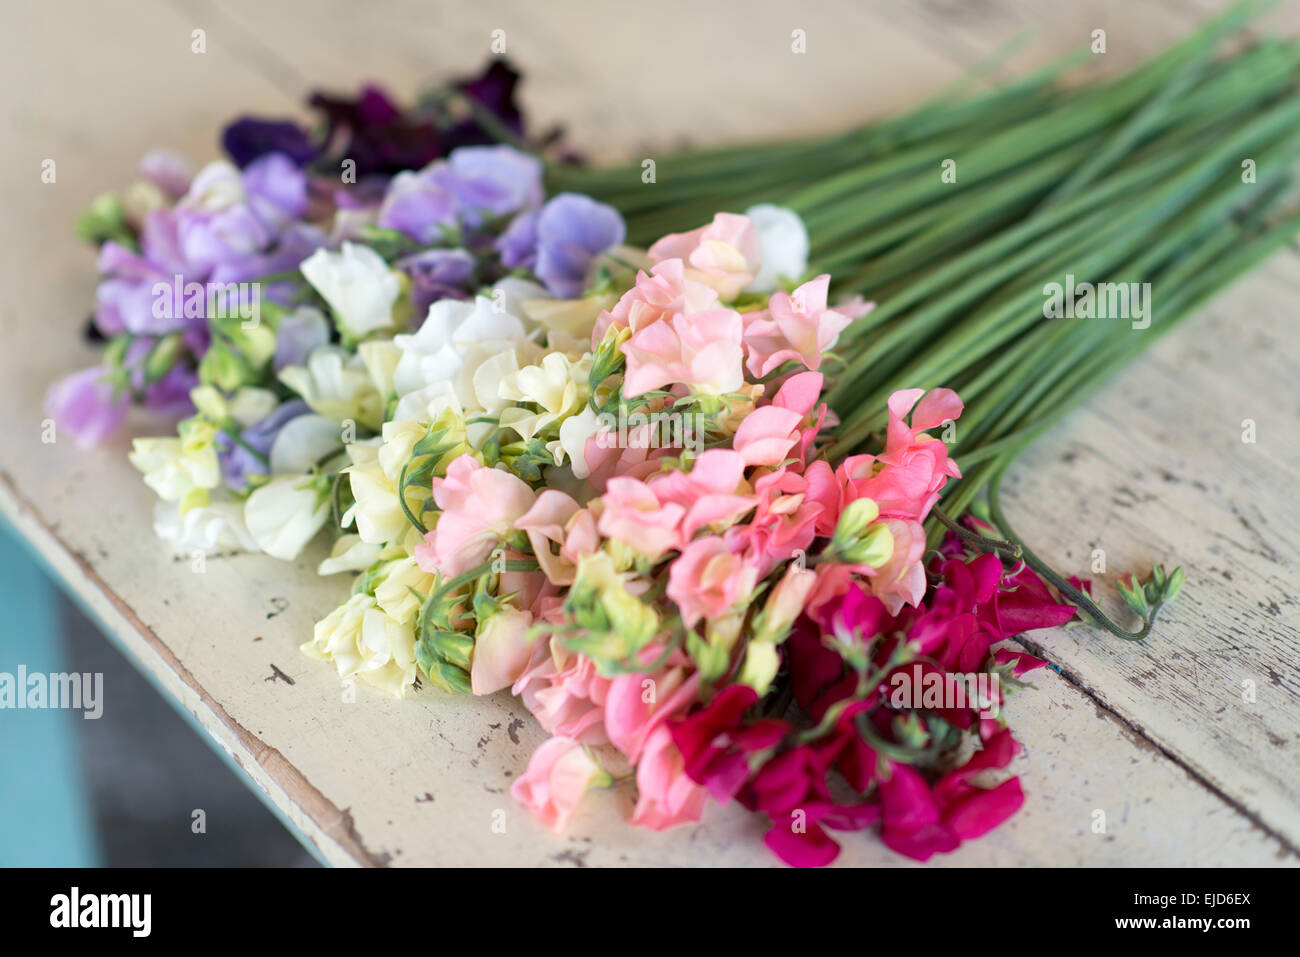 Sweet Peas Lathyrus odoratus Dynasty Spring Sunshine Peach Spring Sunshine Champagne Jilly White Supreme Winter - Stock Image